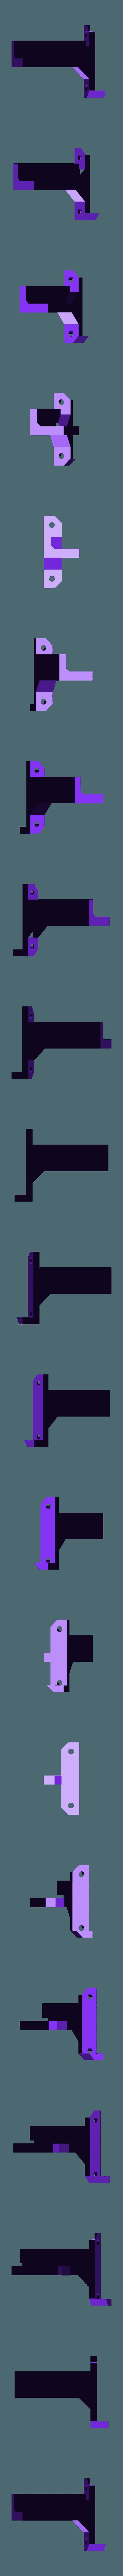 k8200_mounting_bracket2.stl Download free STL file Geared Extruder 2 • Design to 3D print, Job